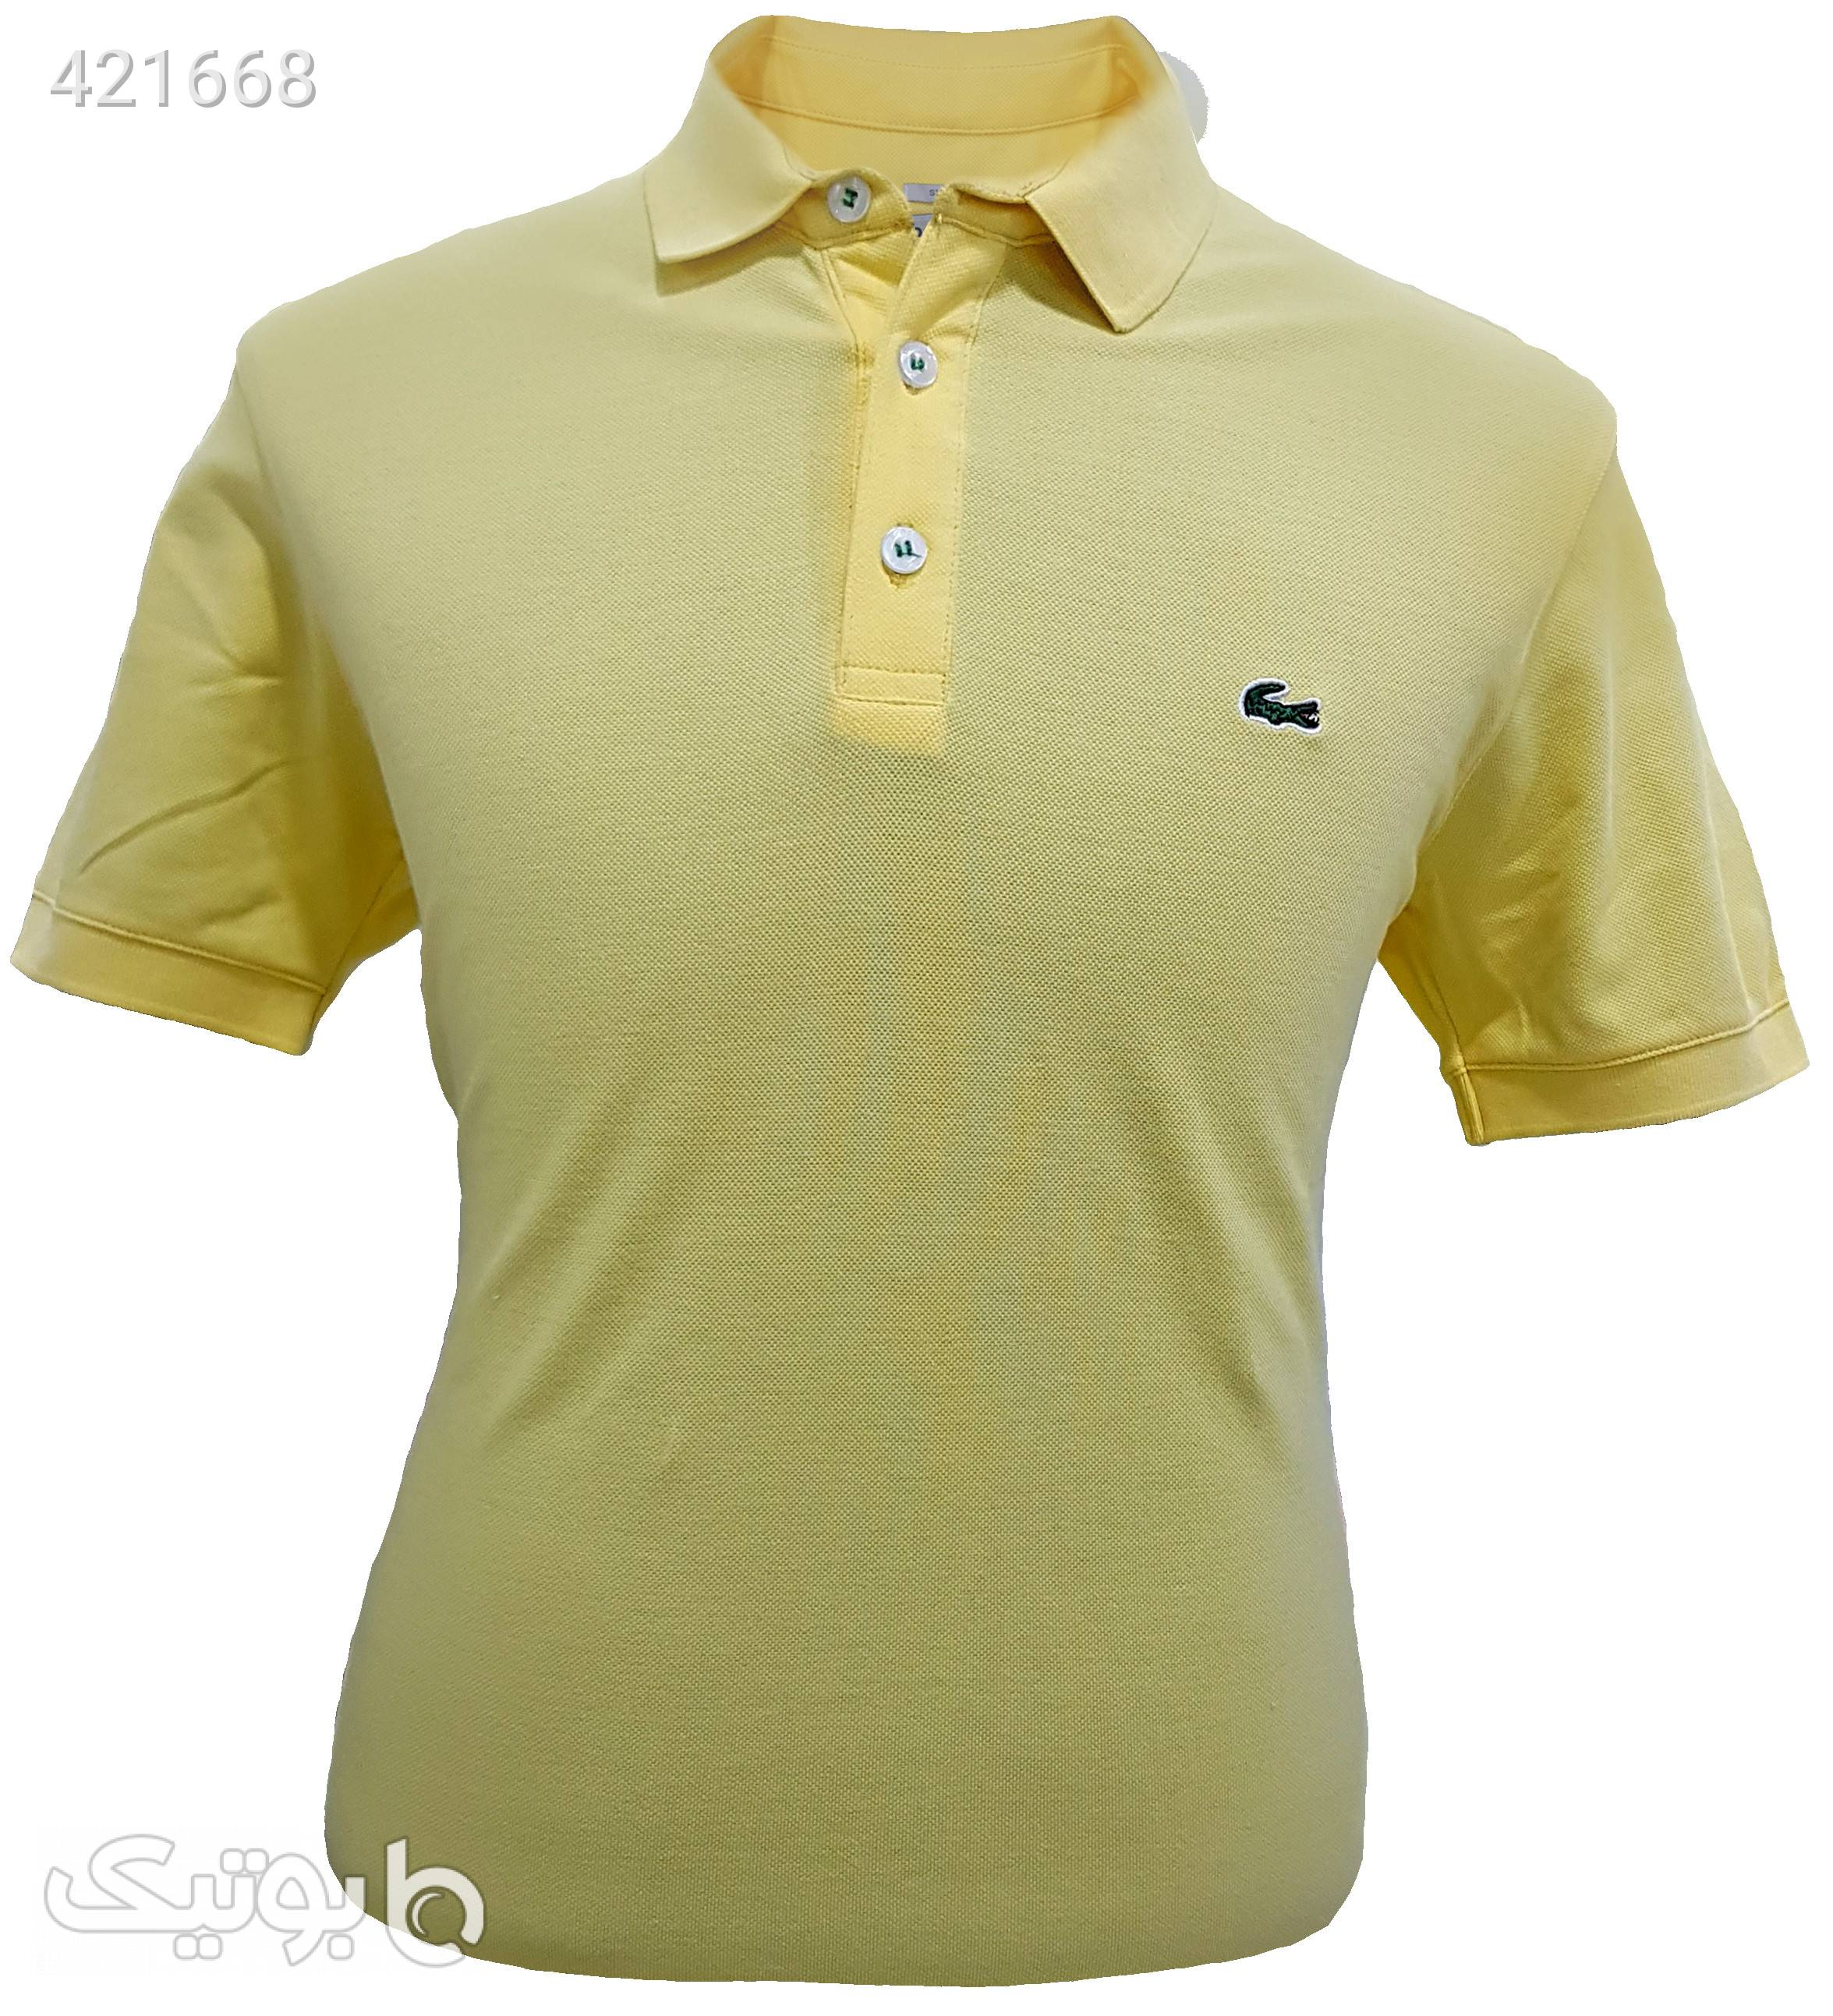 تیشرت جودون زرد تی شرت و پولو شرت مردانه